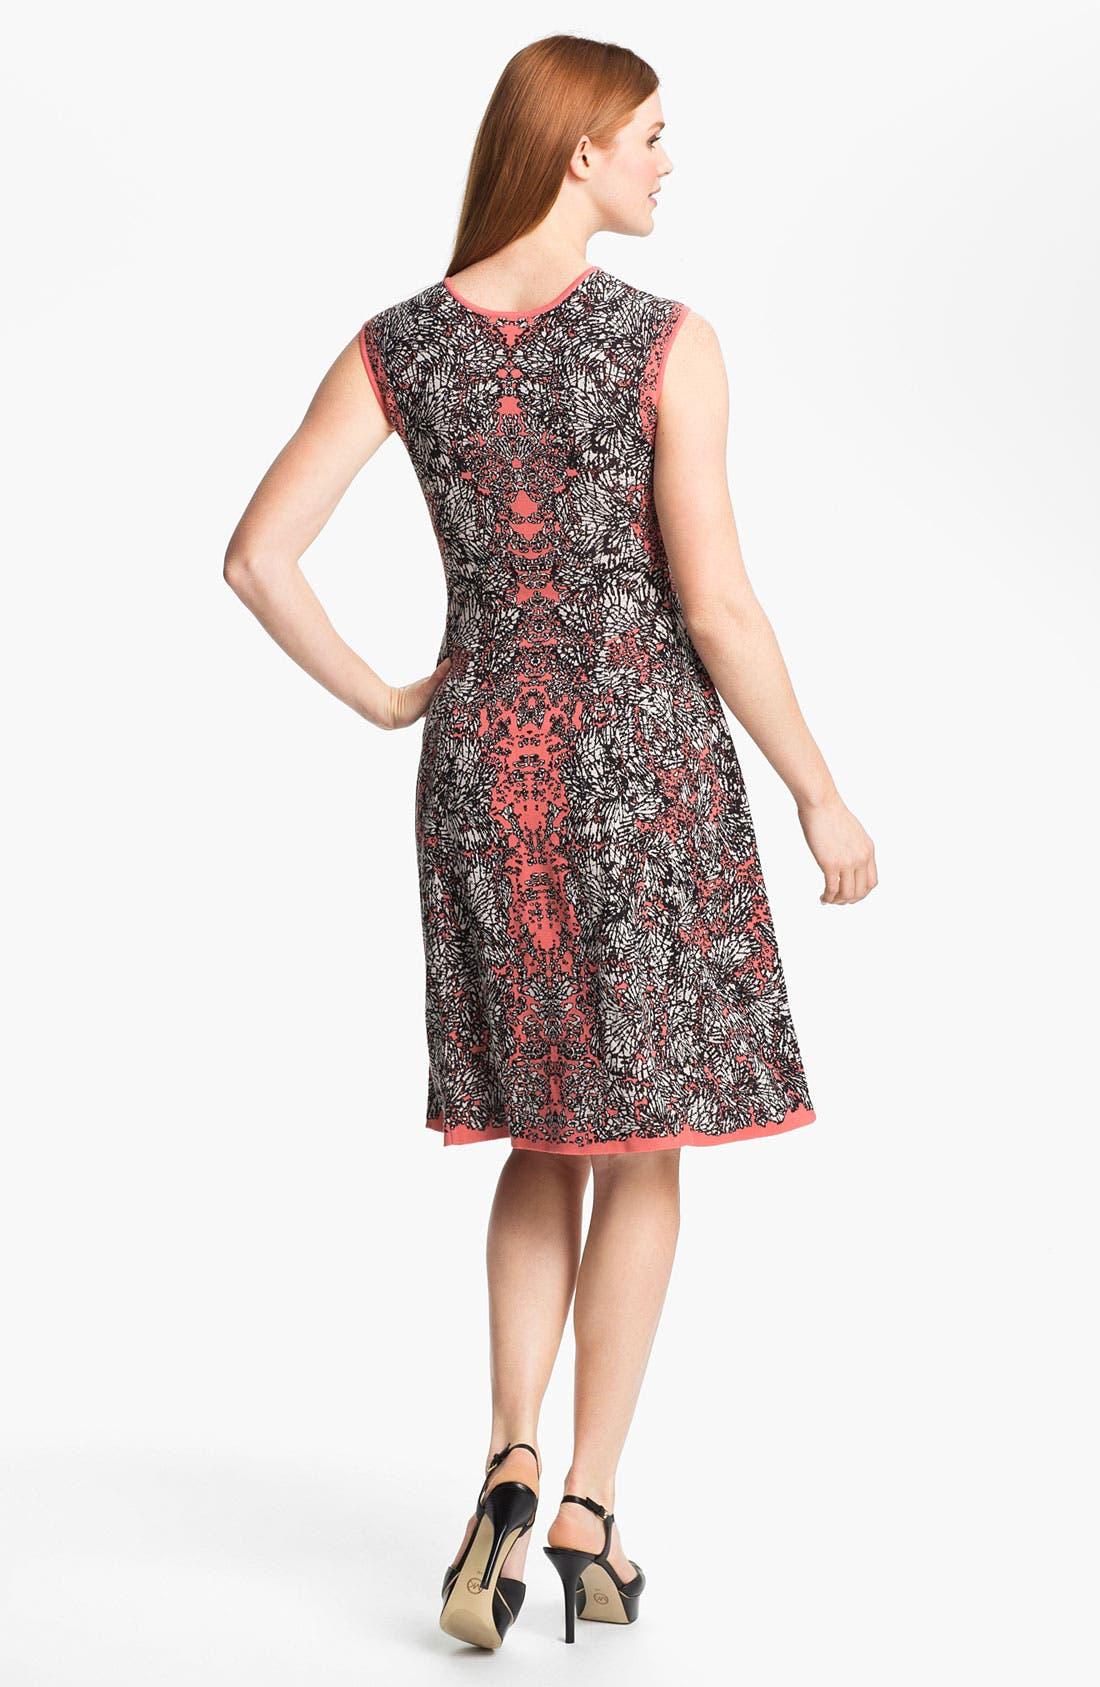 Alternate Image 2  - Nic + Zoe 'Peeking Out' Print Dress